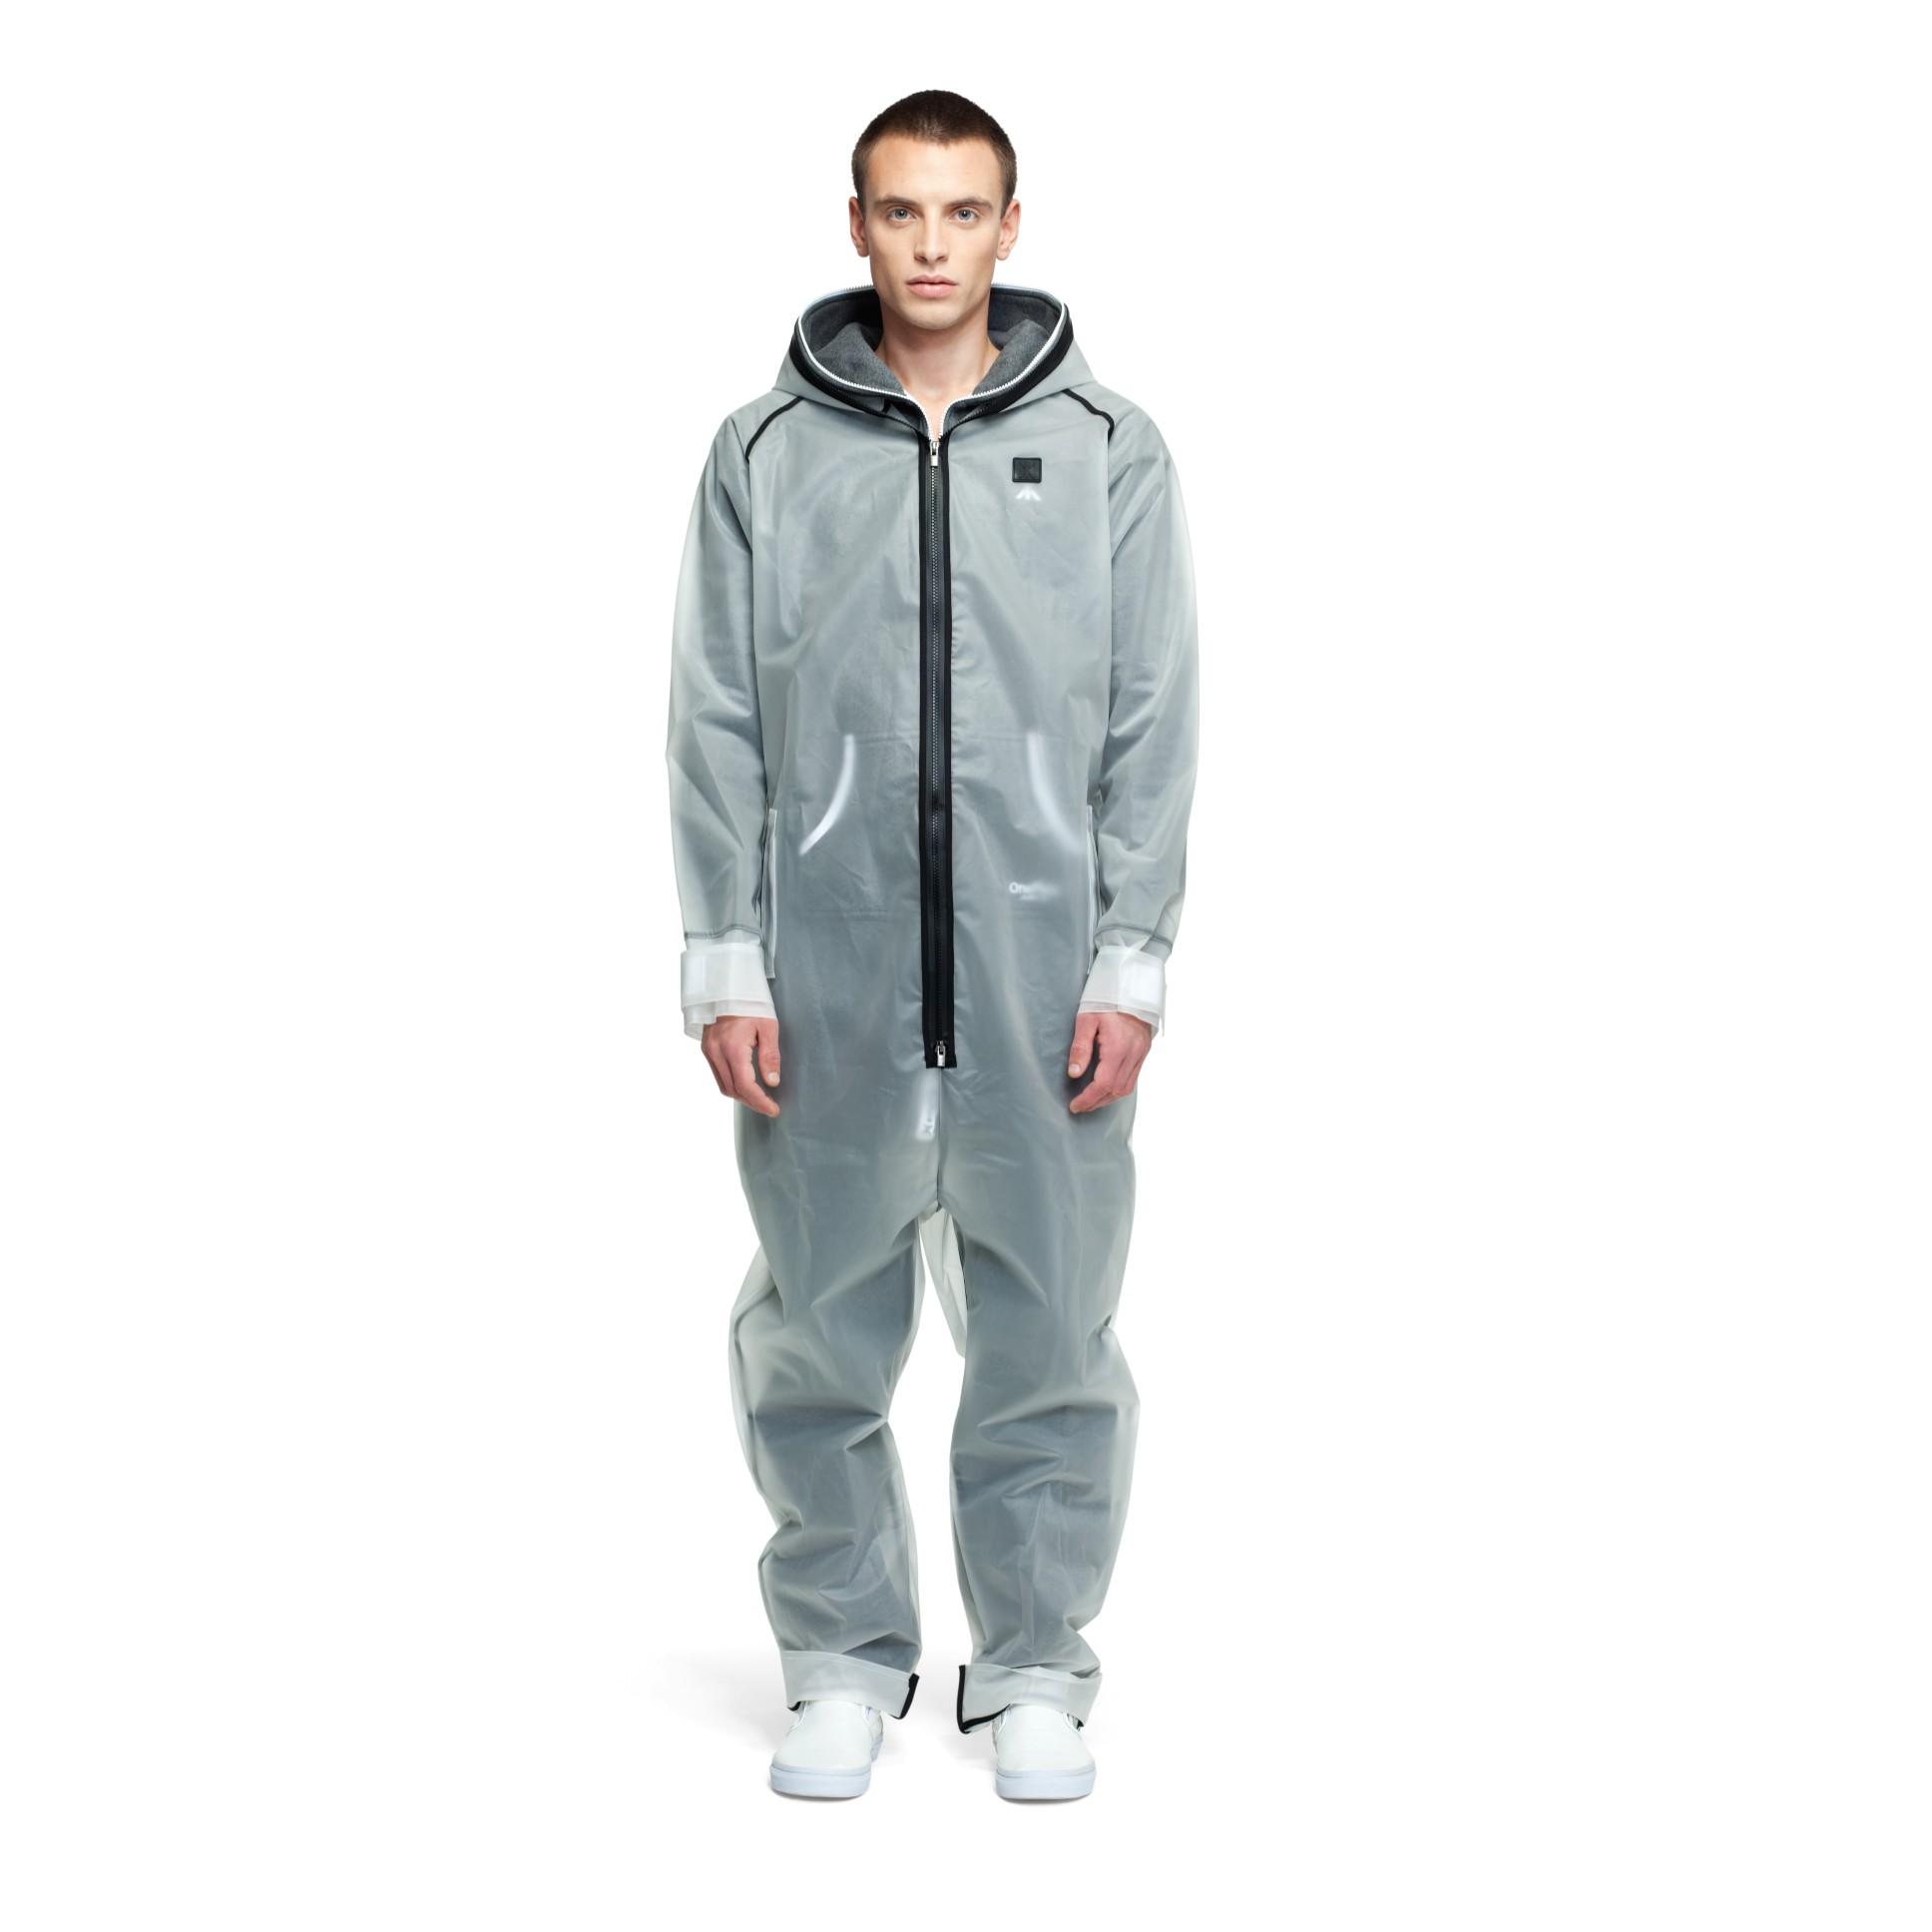 rain jumpsuit transparent frosted onesie onepiece uk. Black Bedroom Furniture Sets. Home Design Ideas